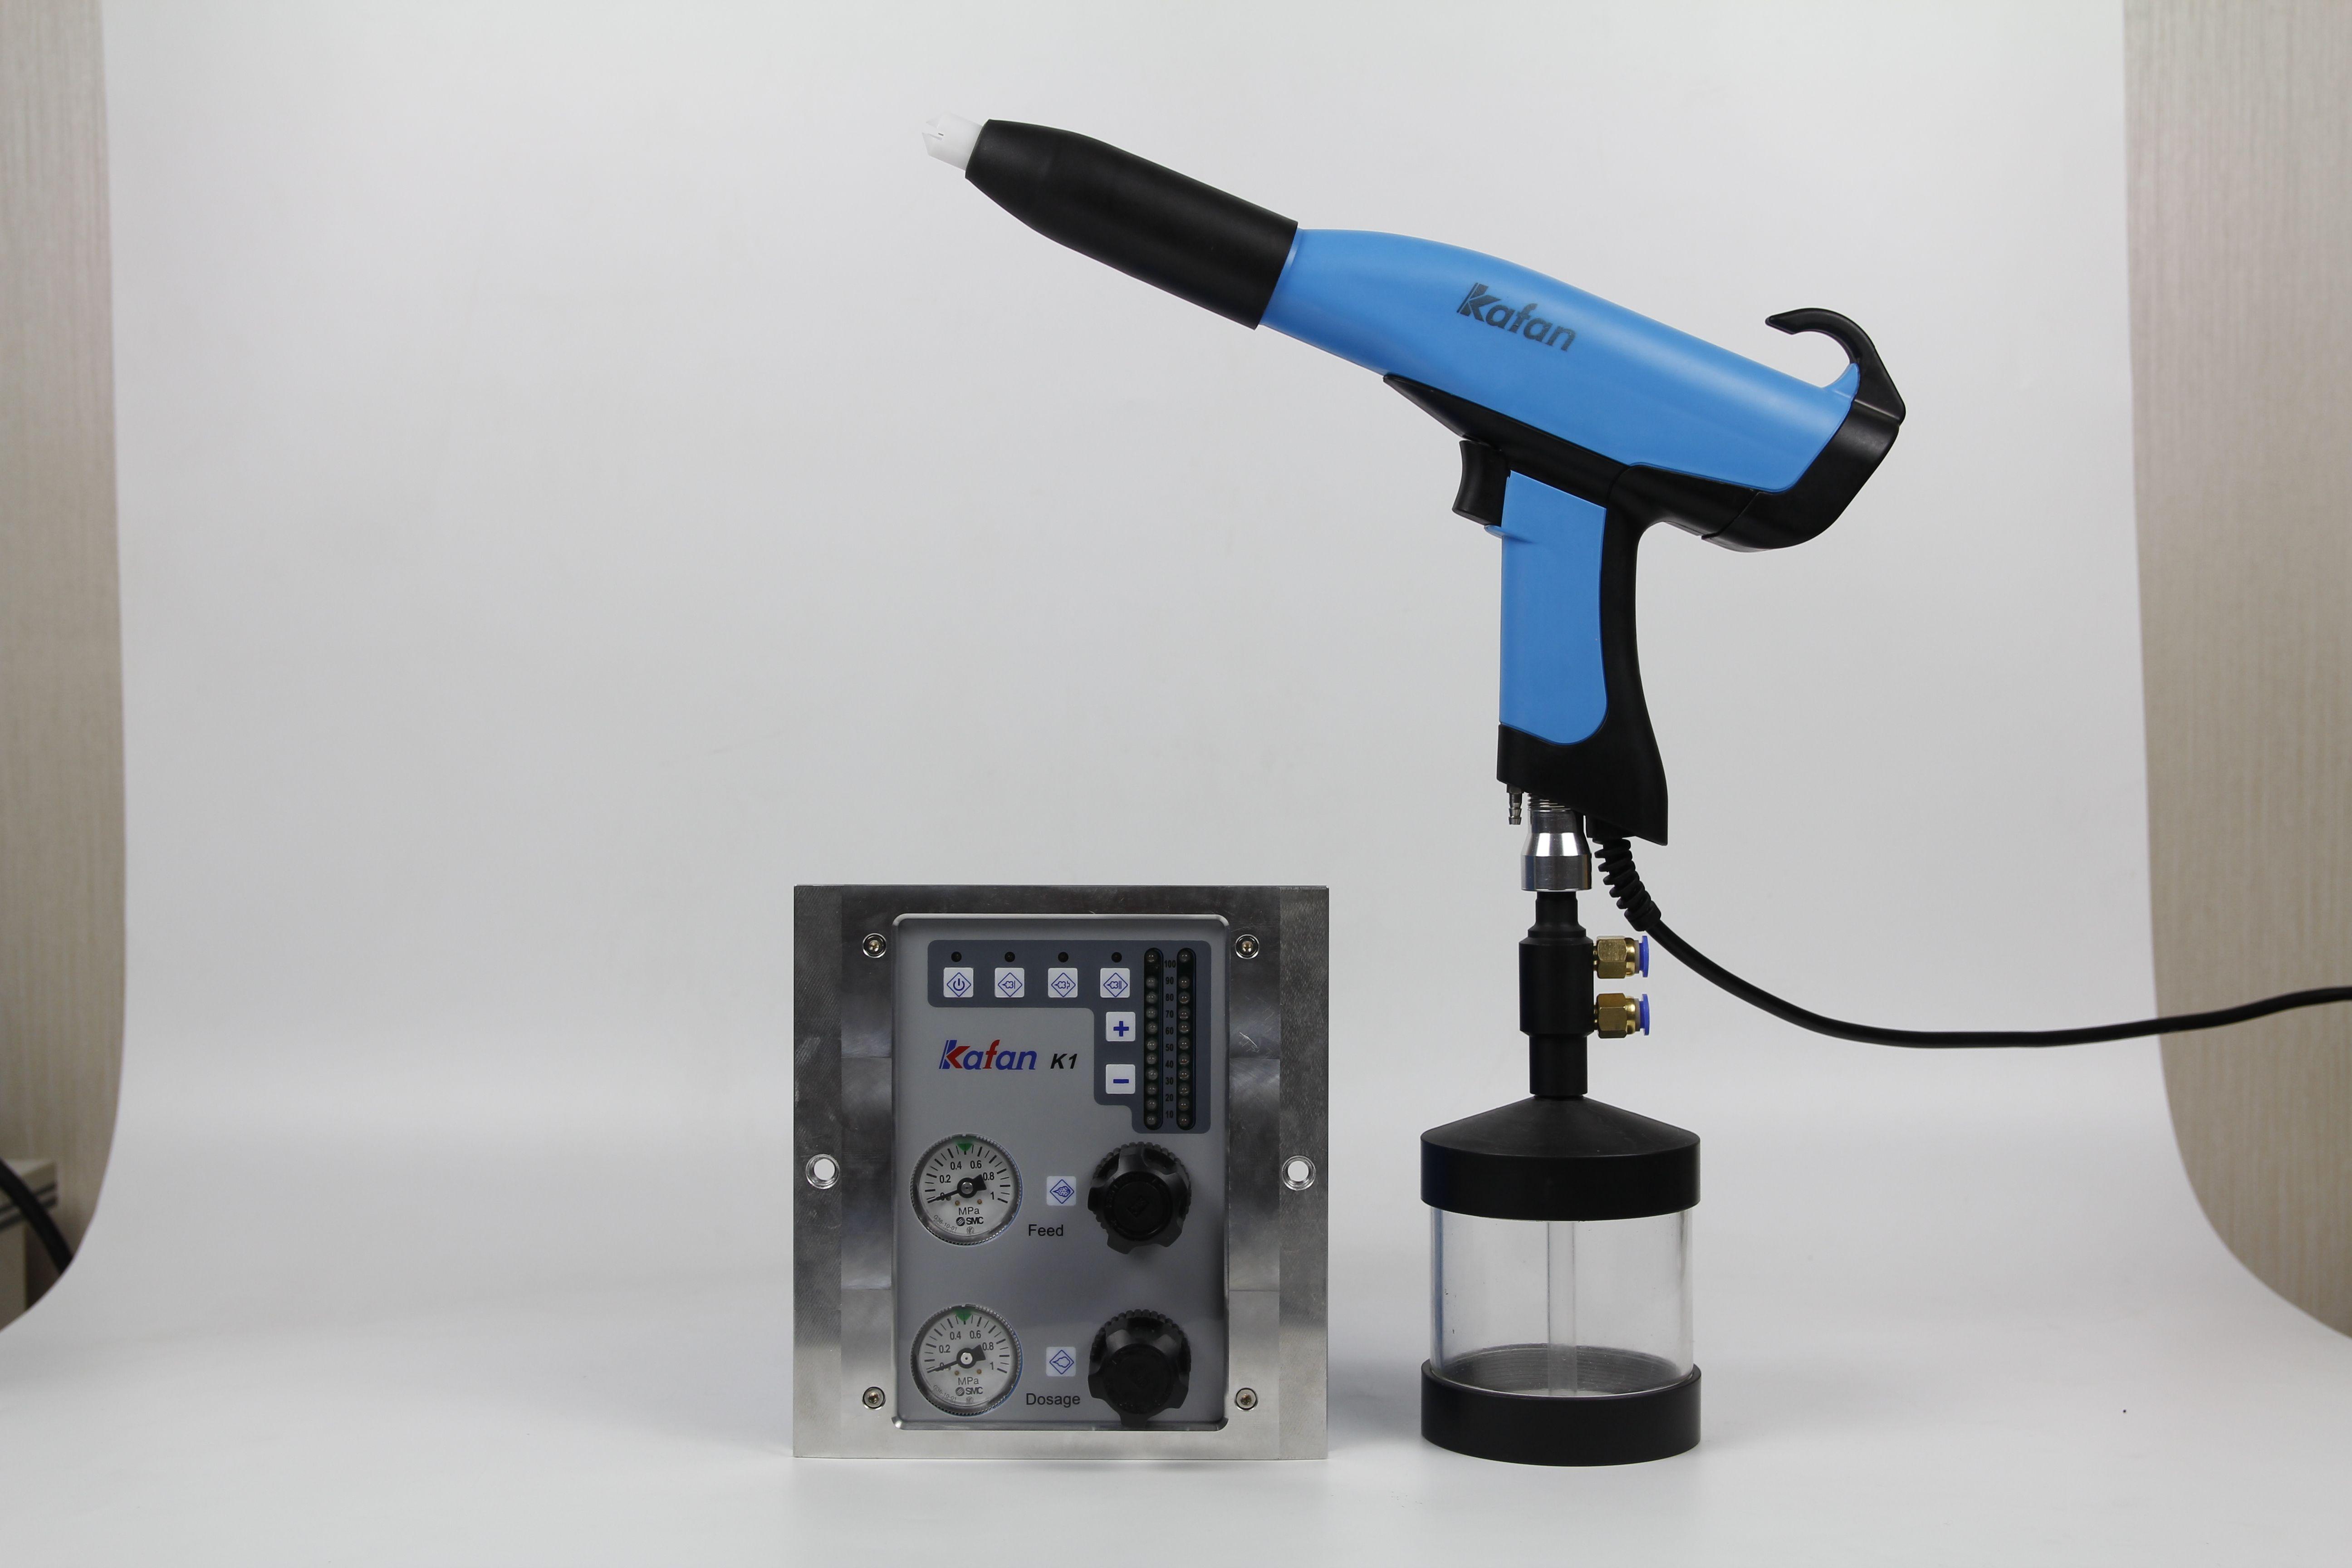 Pin on kafan k1 Series Electrostatic Powder Coating Paint